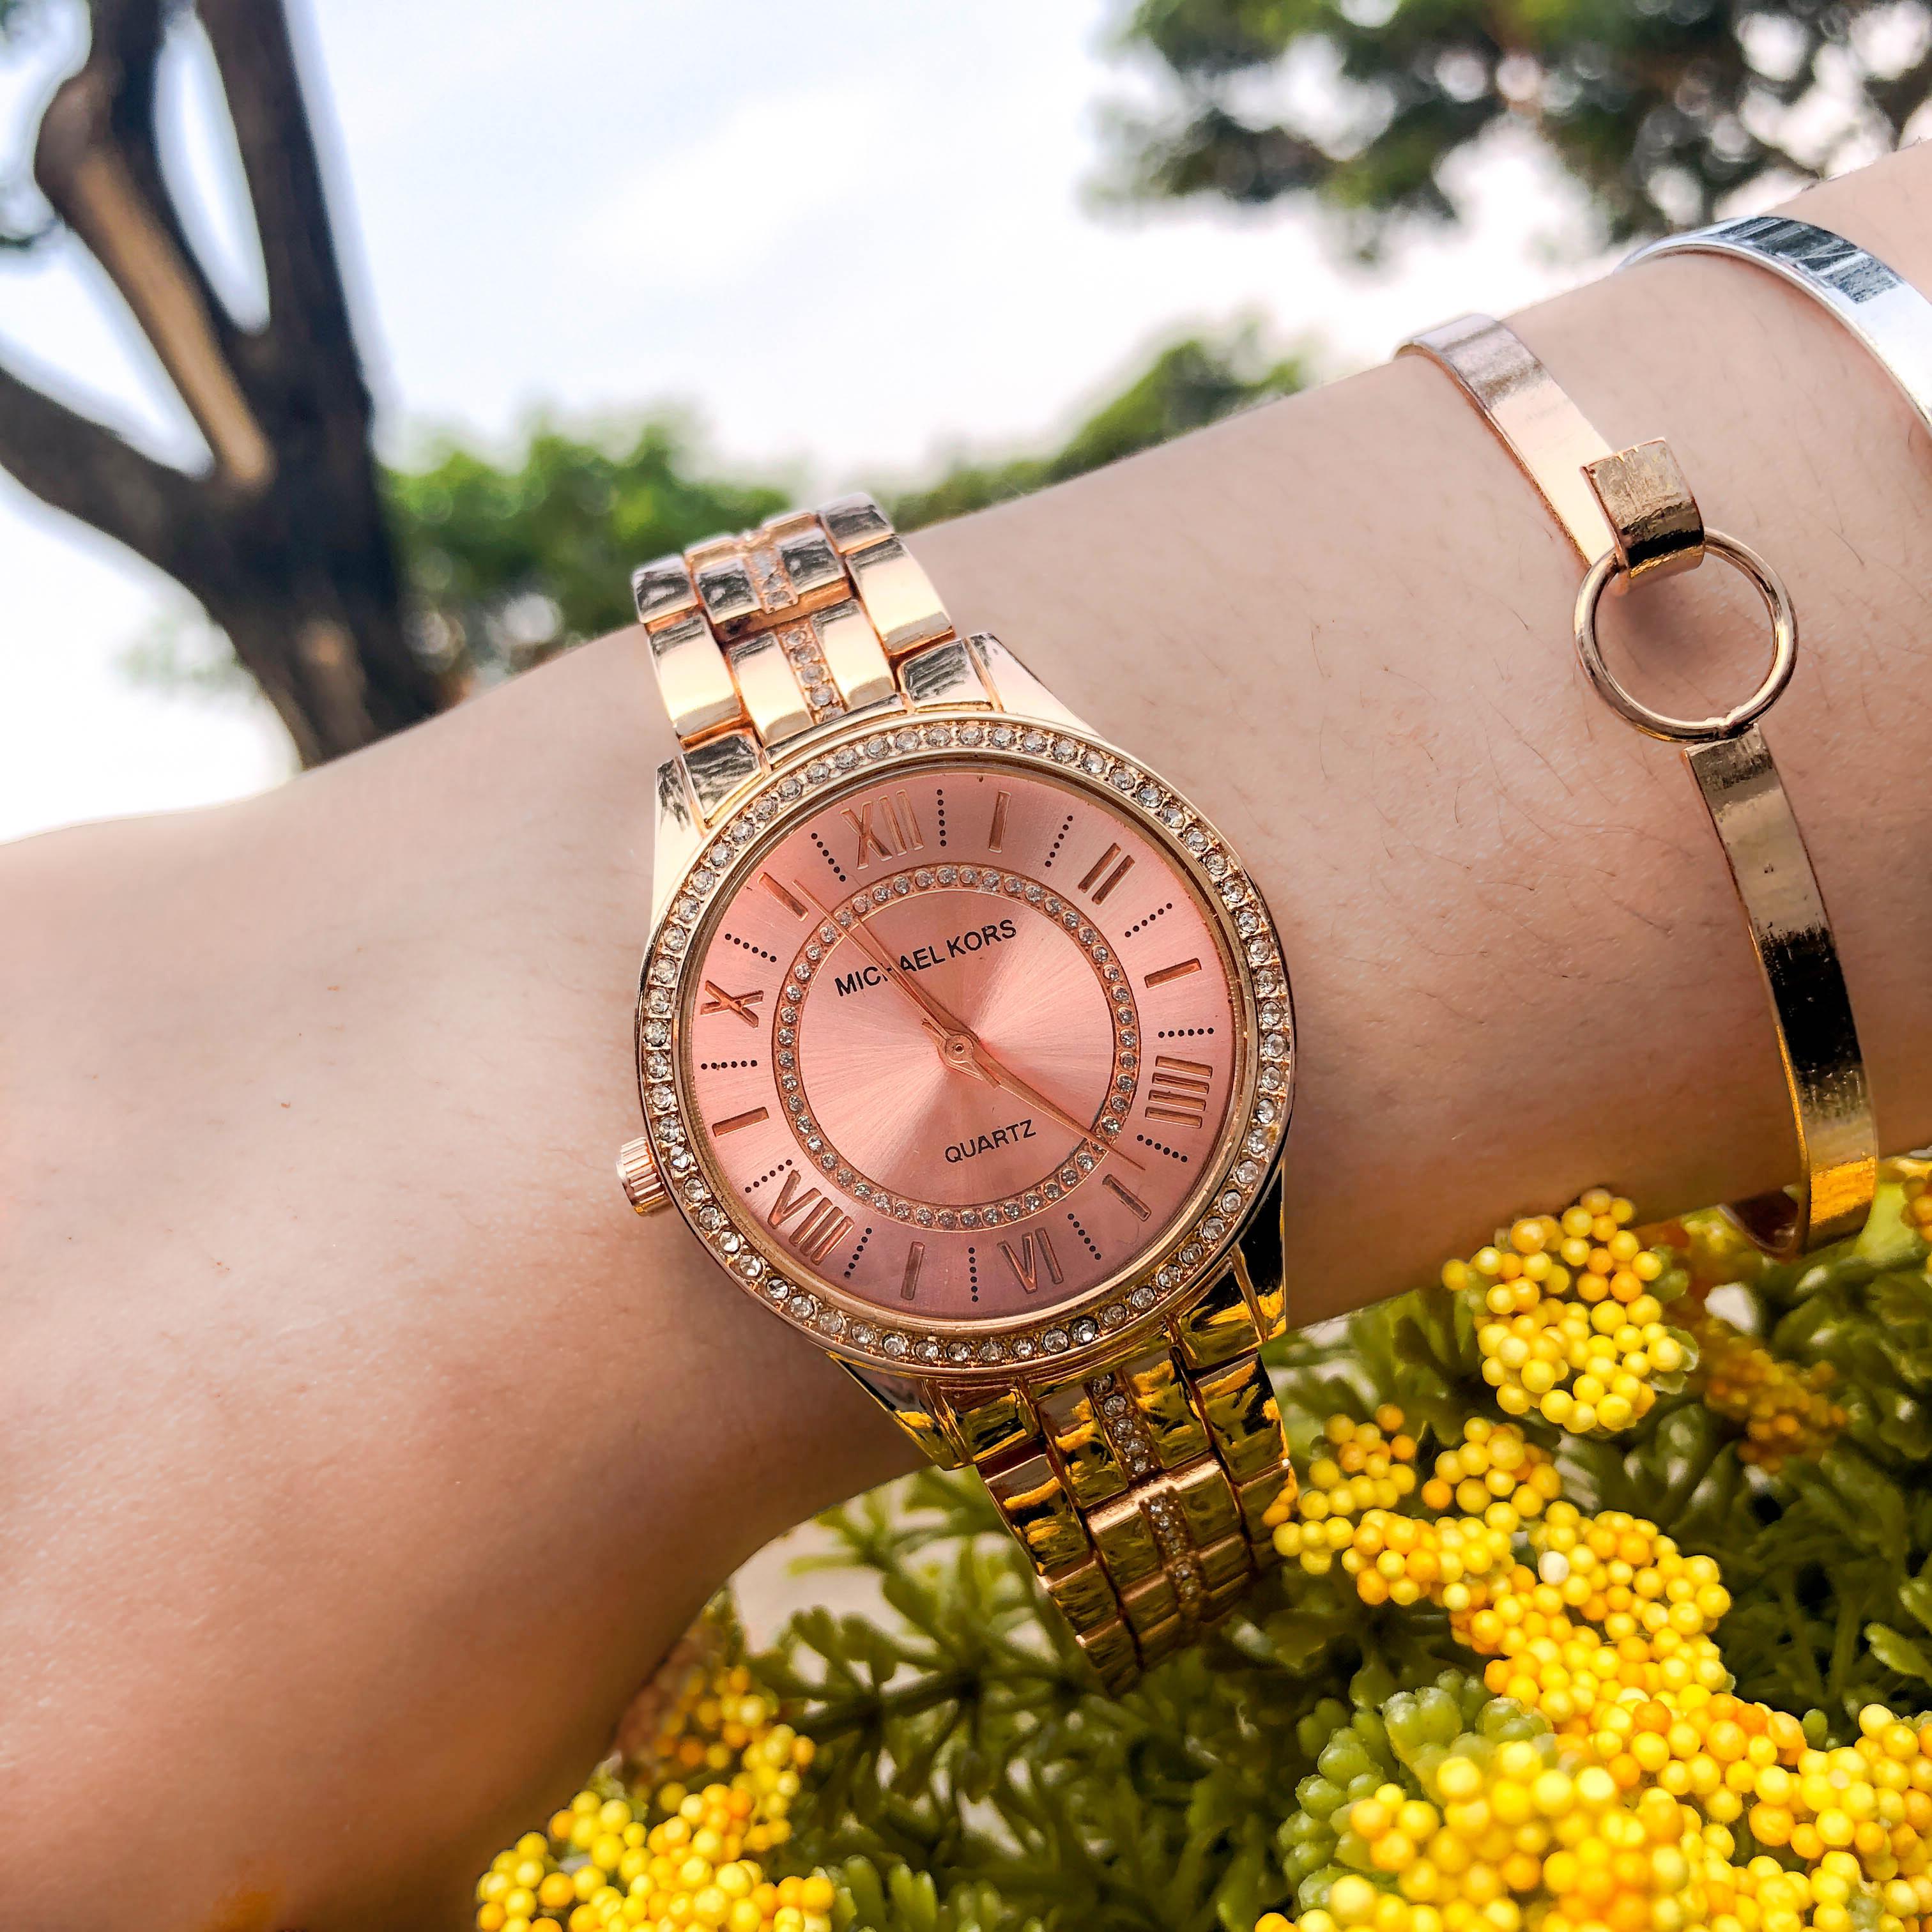 Jam Tangan MICHAEL KORS Fashion Watch Chain Rose Gold Frame Rose Gold Dial Rose Gold Band MKO005